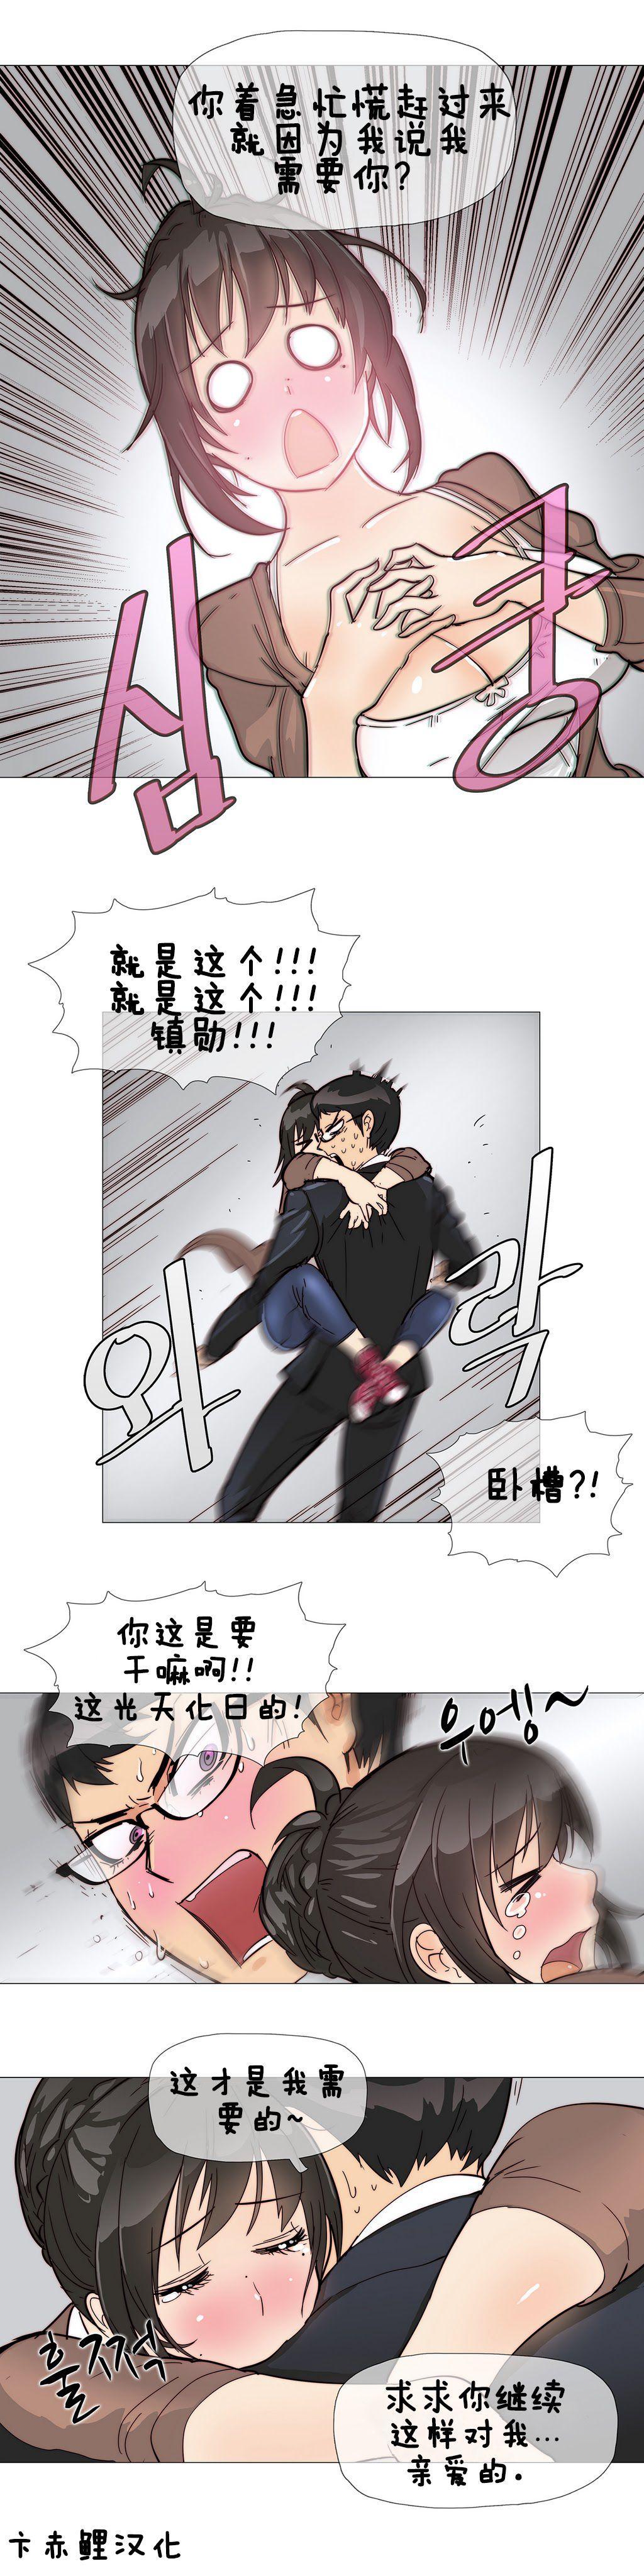 HouseHold Affairs 【卞赤鲤个人汉化】1~21话(持续更新中) 88